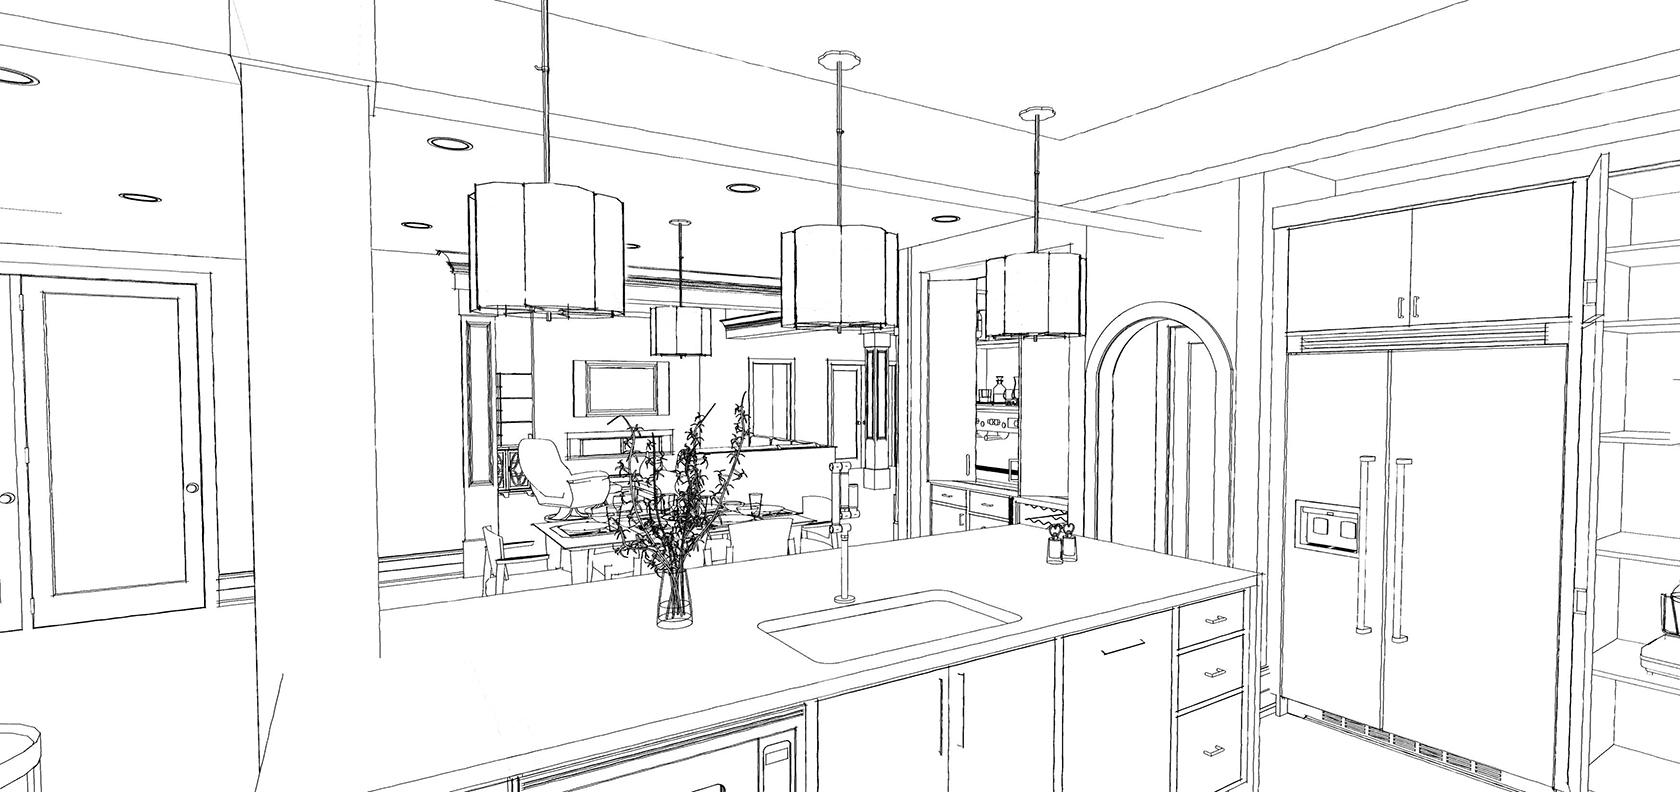 Michael-Buss-Architects 18025- Kitchen